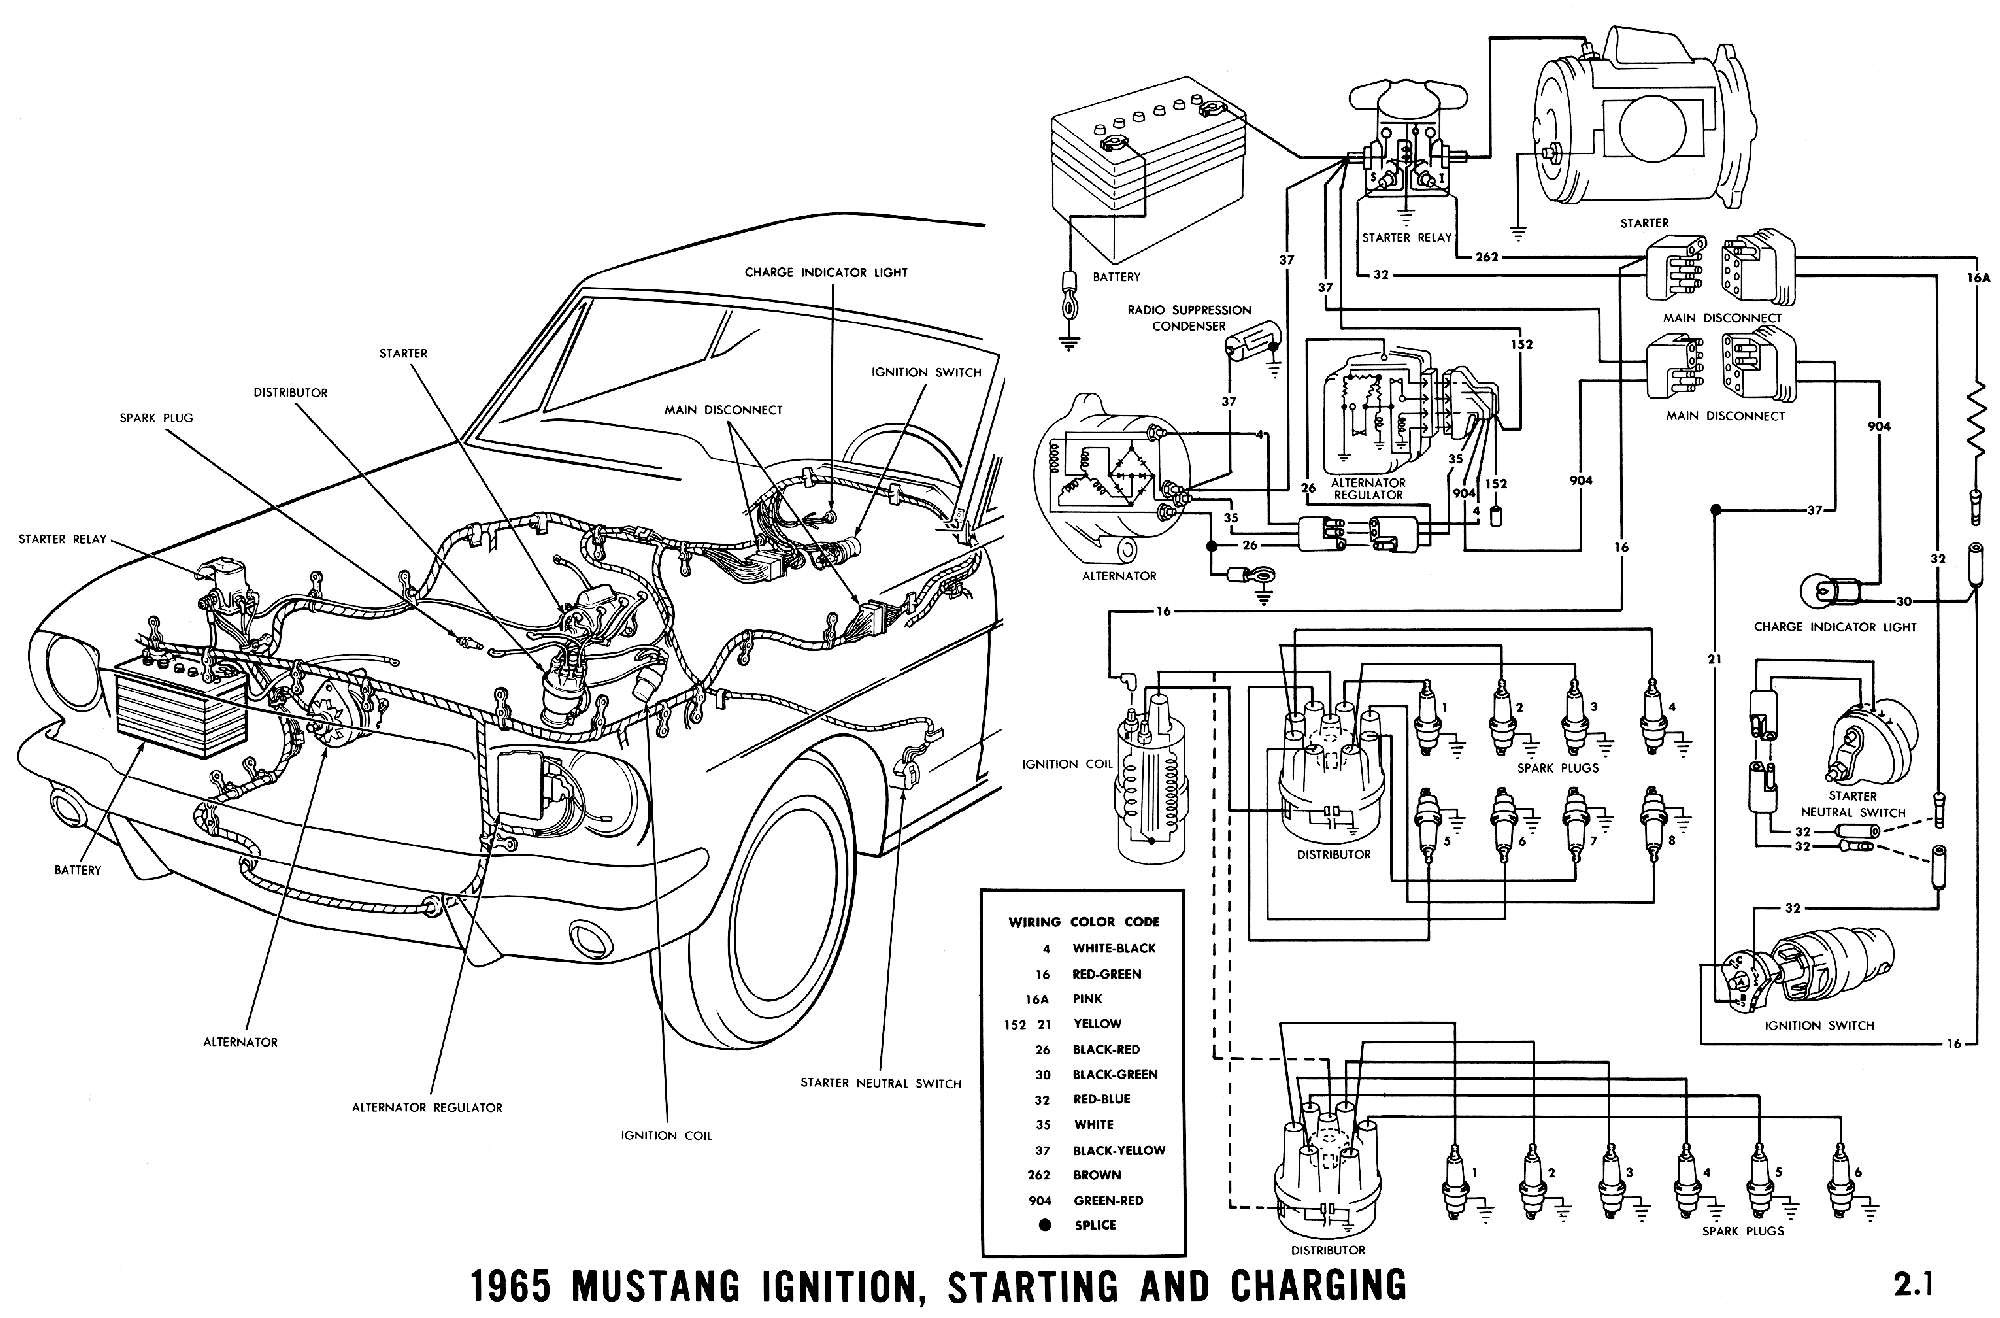 Auto Engine Parts Diagram 2015 Mustang Engine Diagram Engine Car Parts and Ponent Diagram Of Auto Engine Parts Diagram